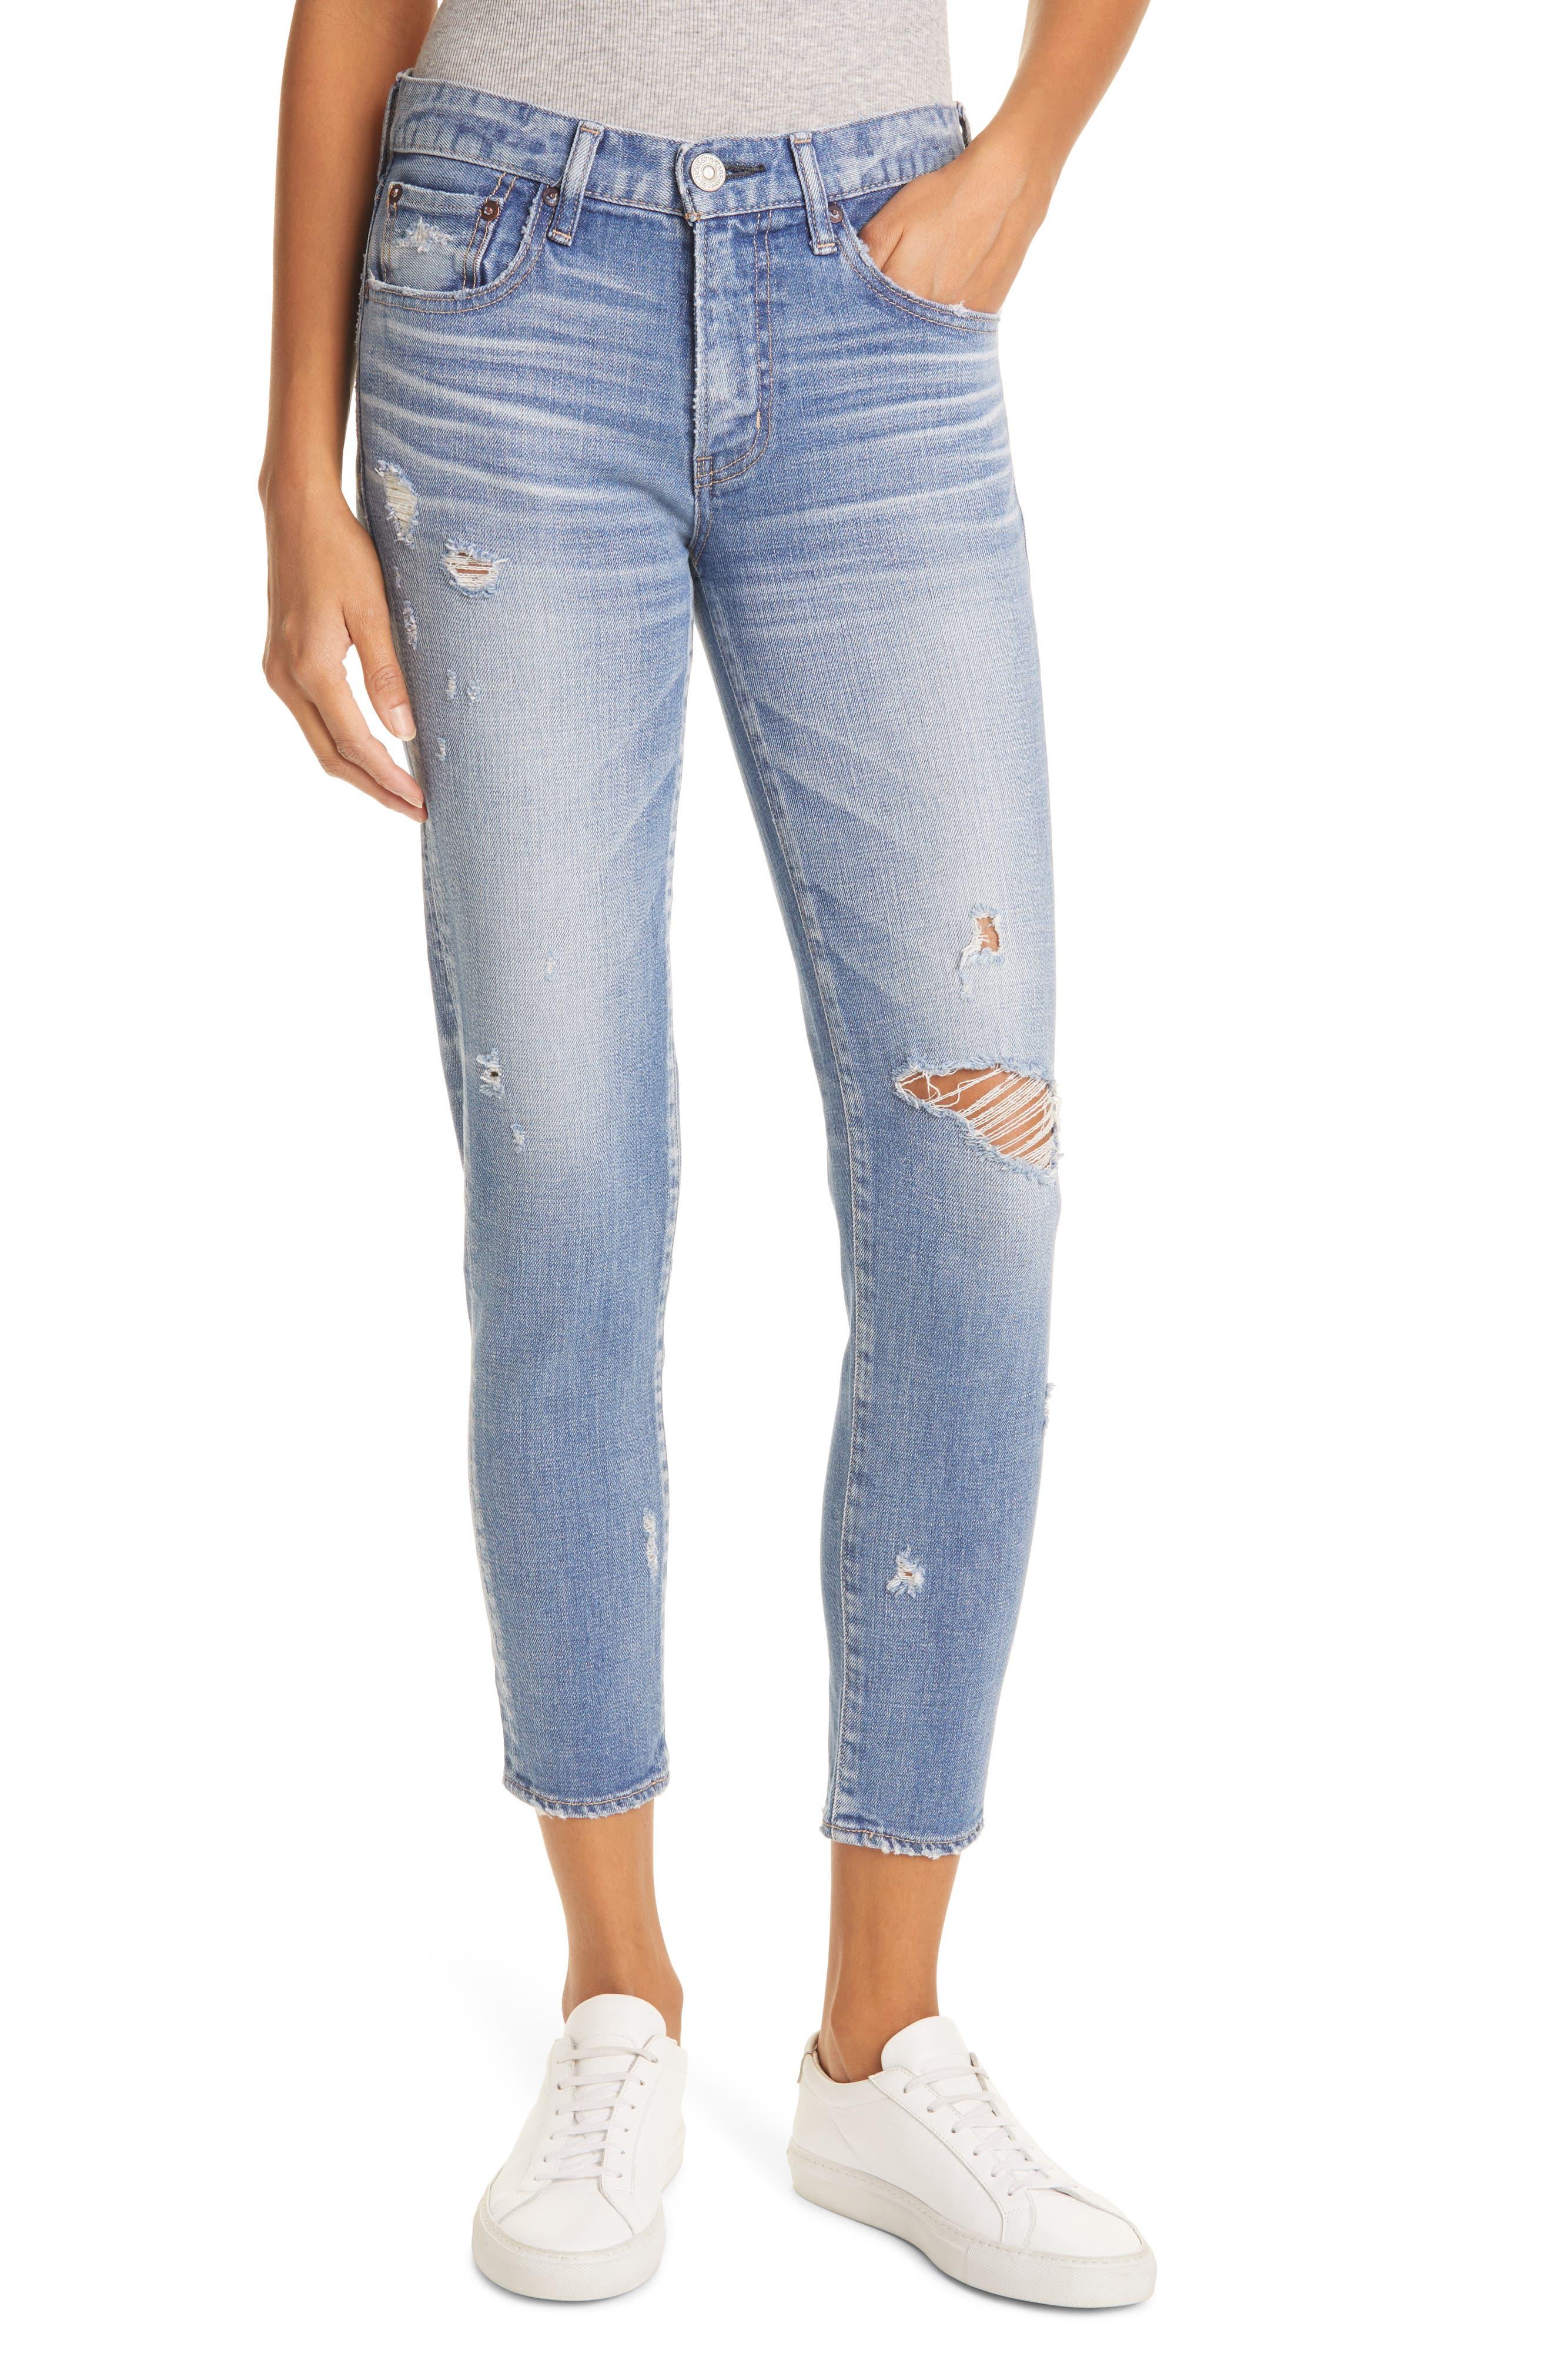 Gleedsville Distressed Skinny Jeans